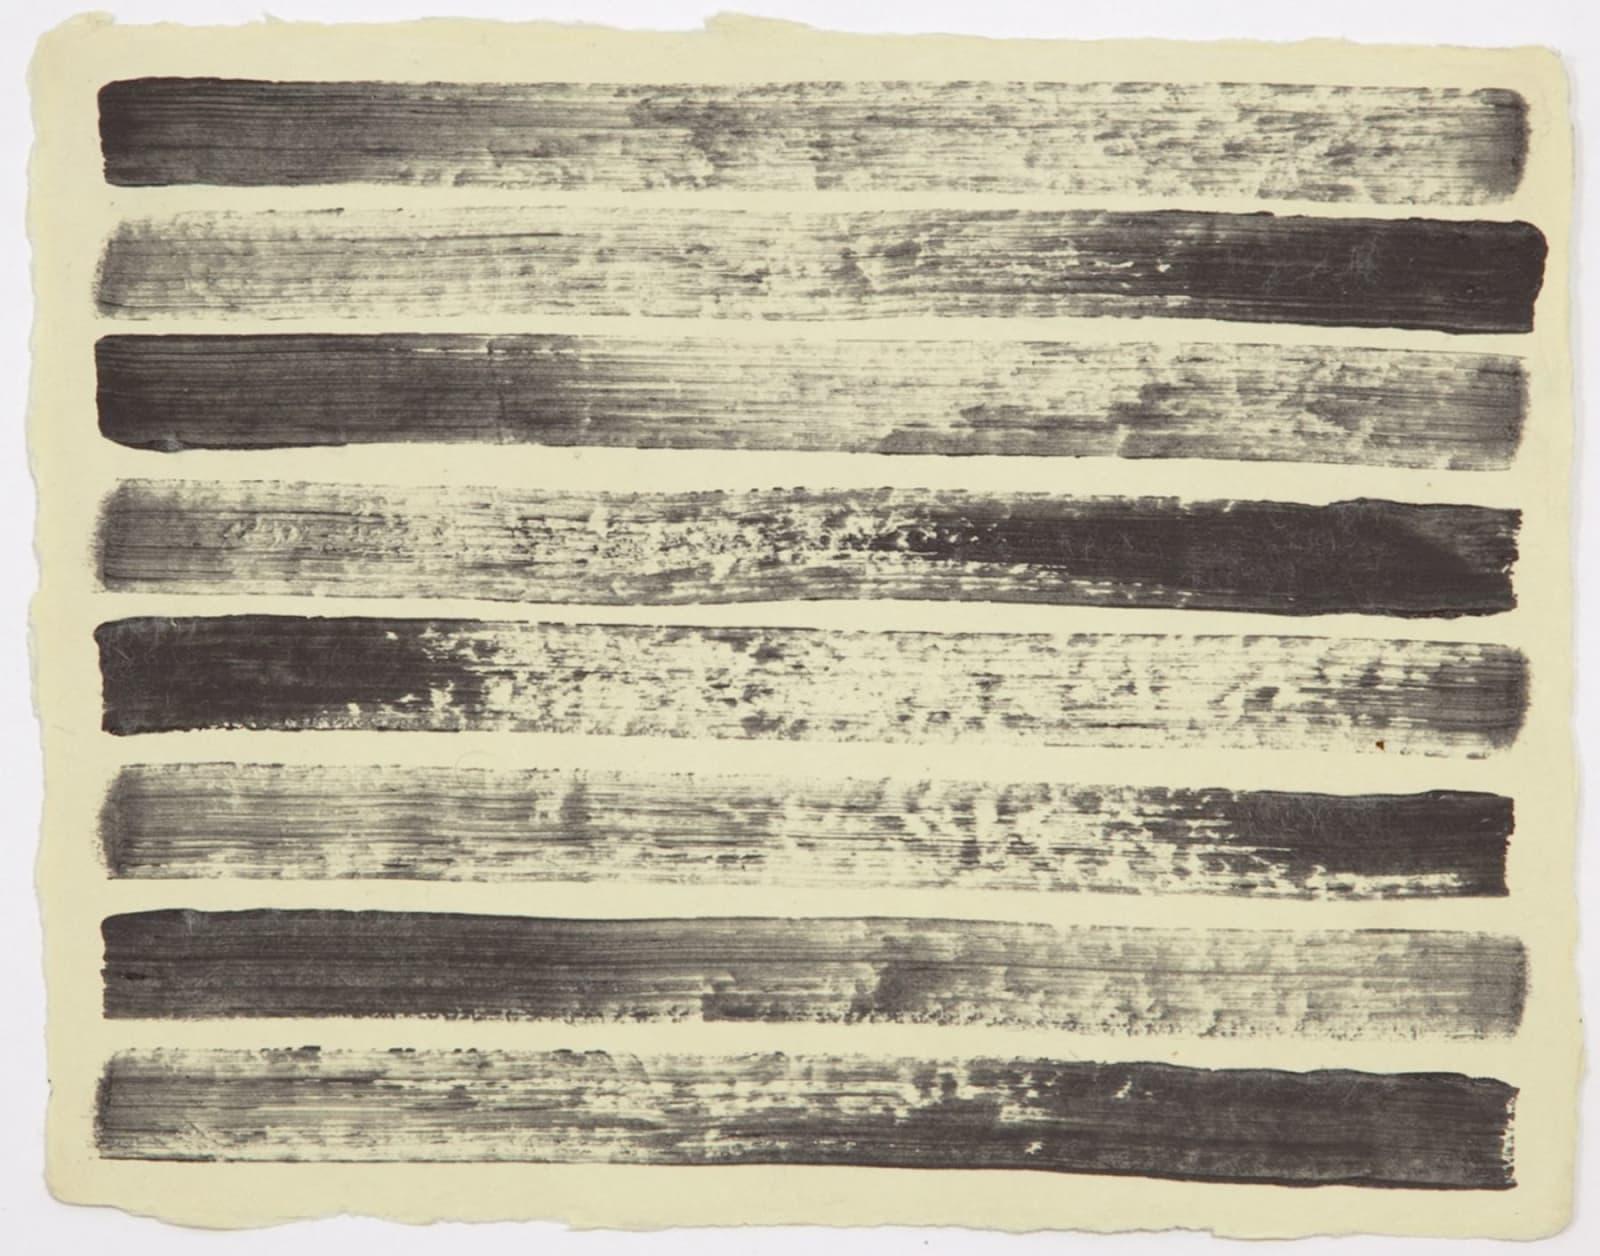 Huguette Caland, Untitled, 1999